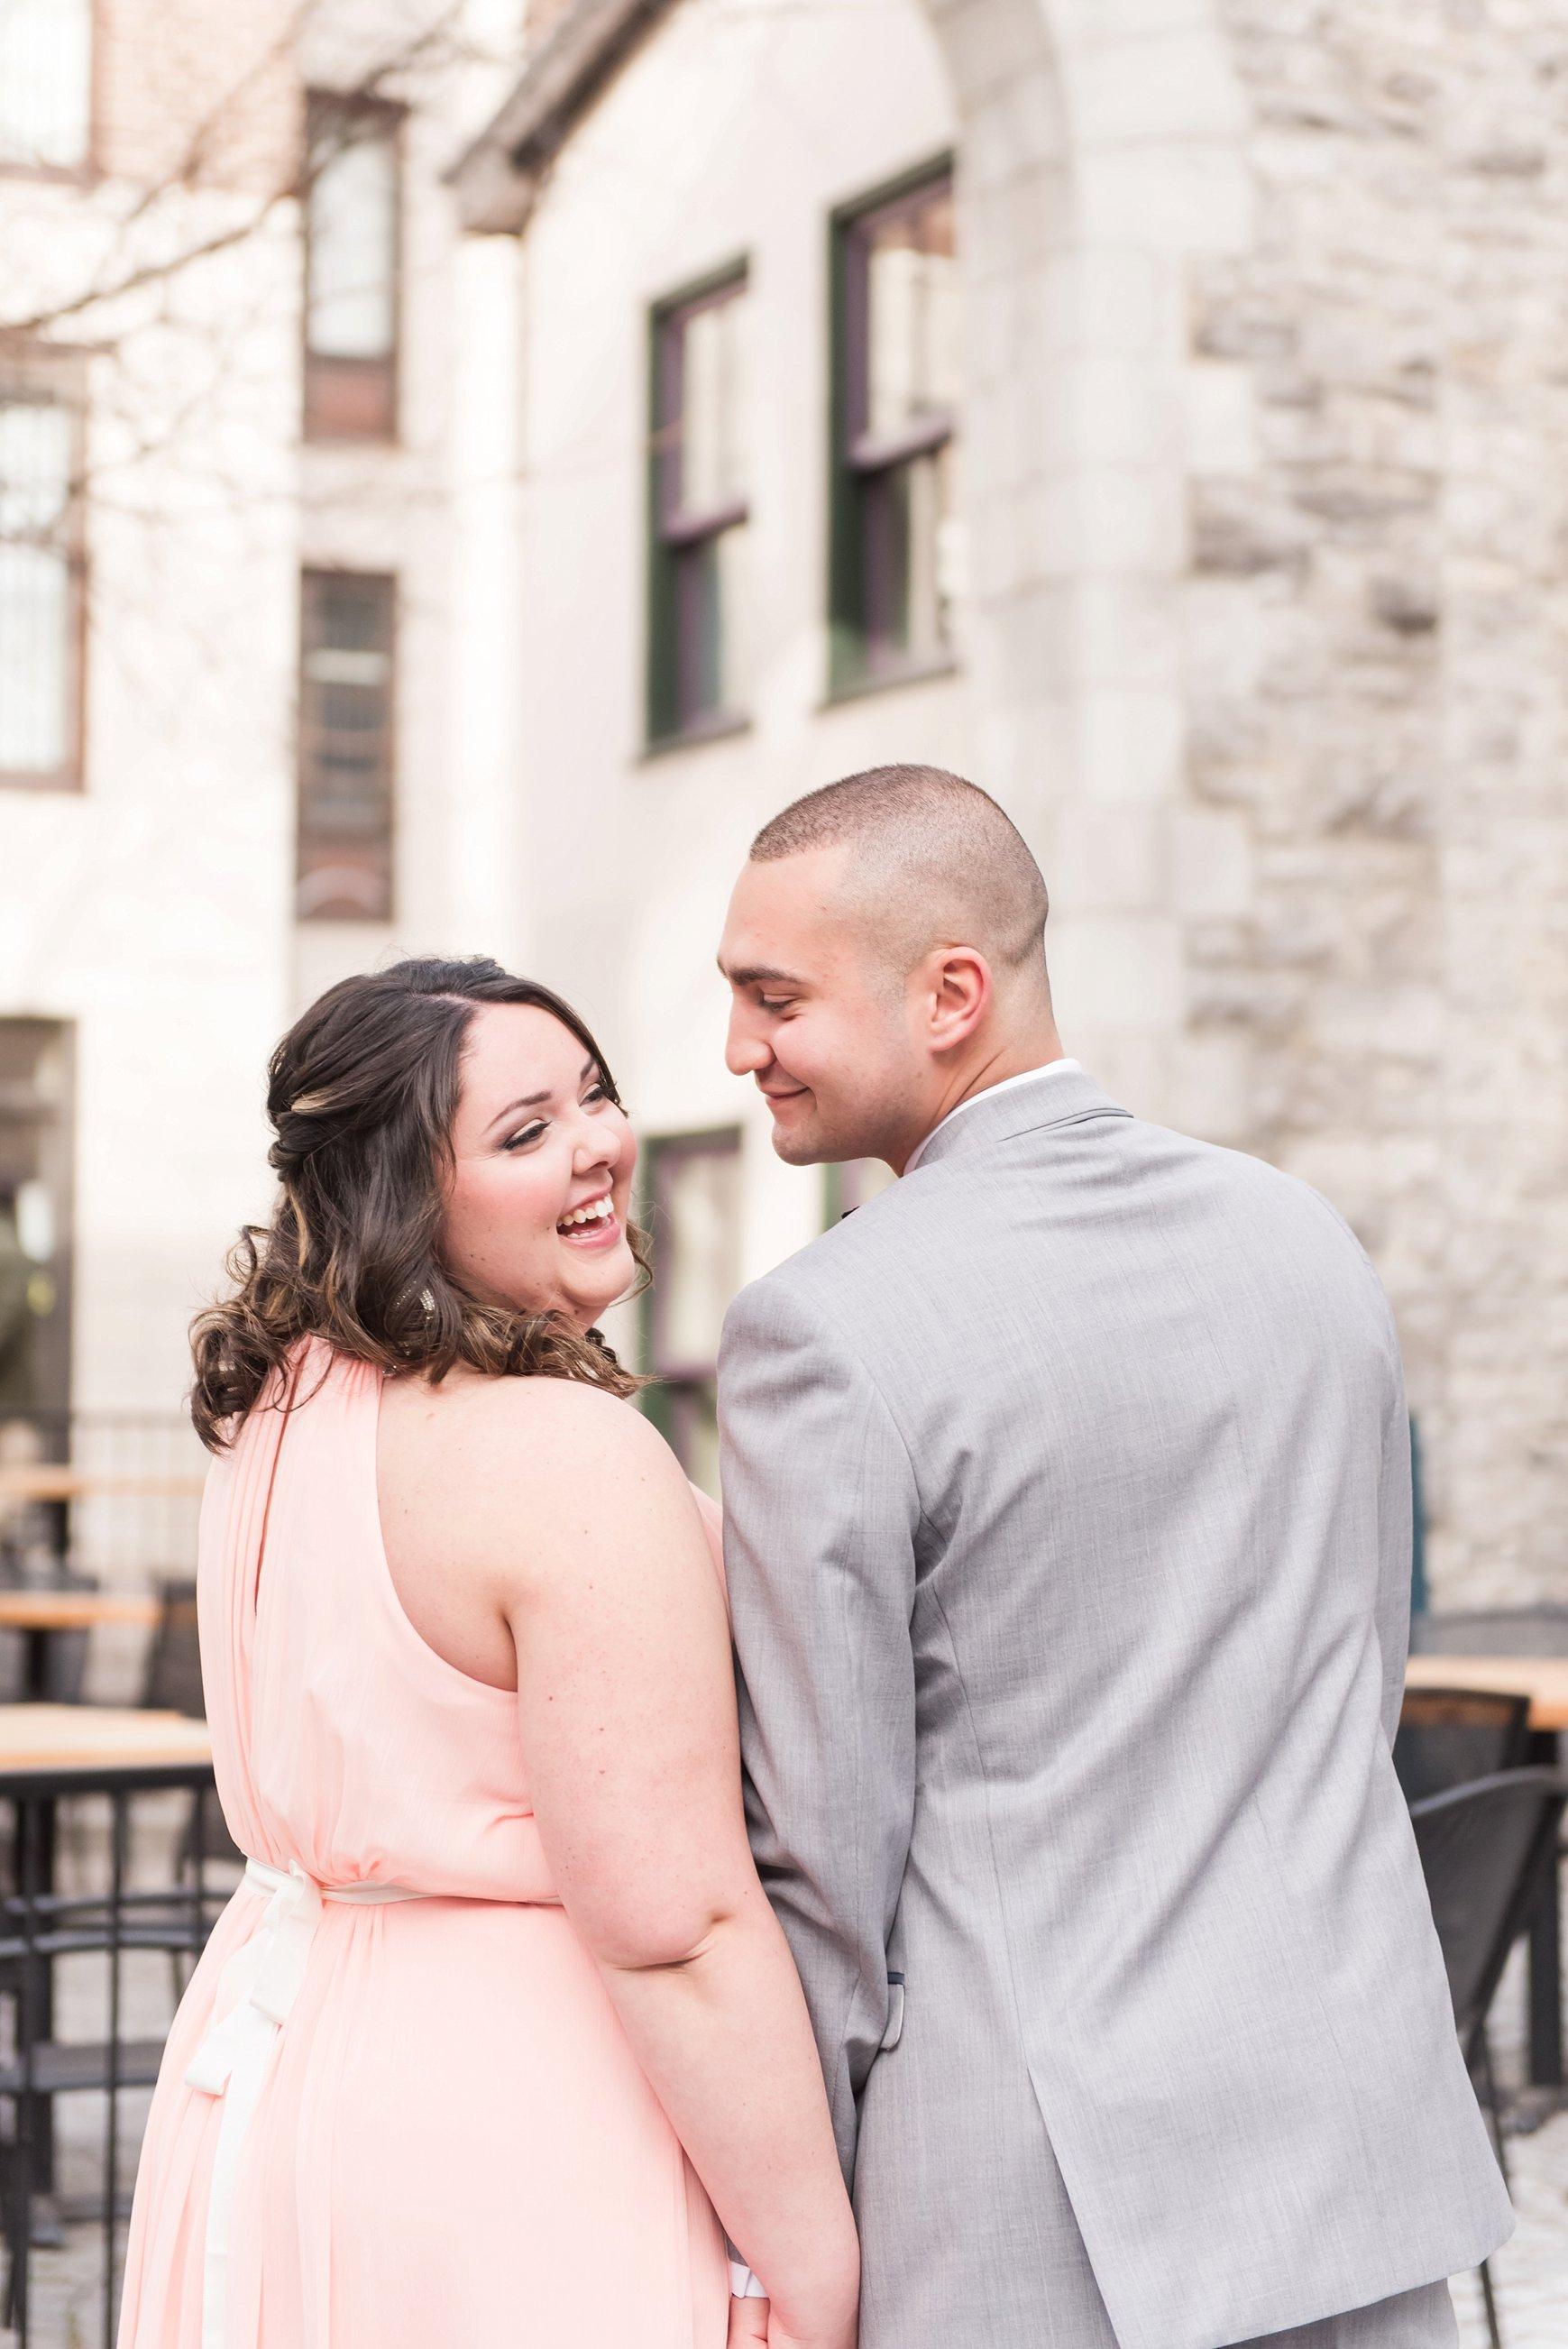 Sarmad Ashley Engagement Shoot- Ali Batoul Creatives Fine Art Wedding Photography_0063.jpg